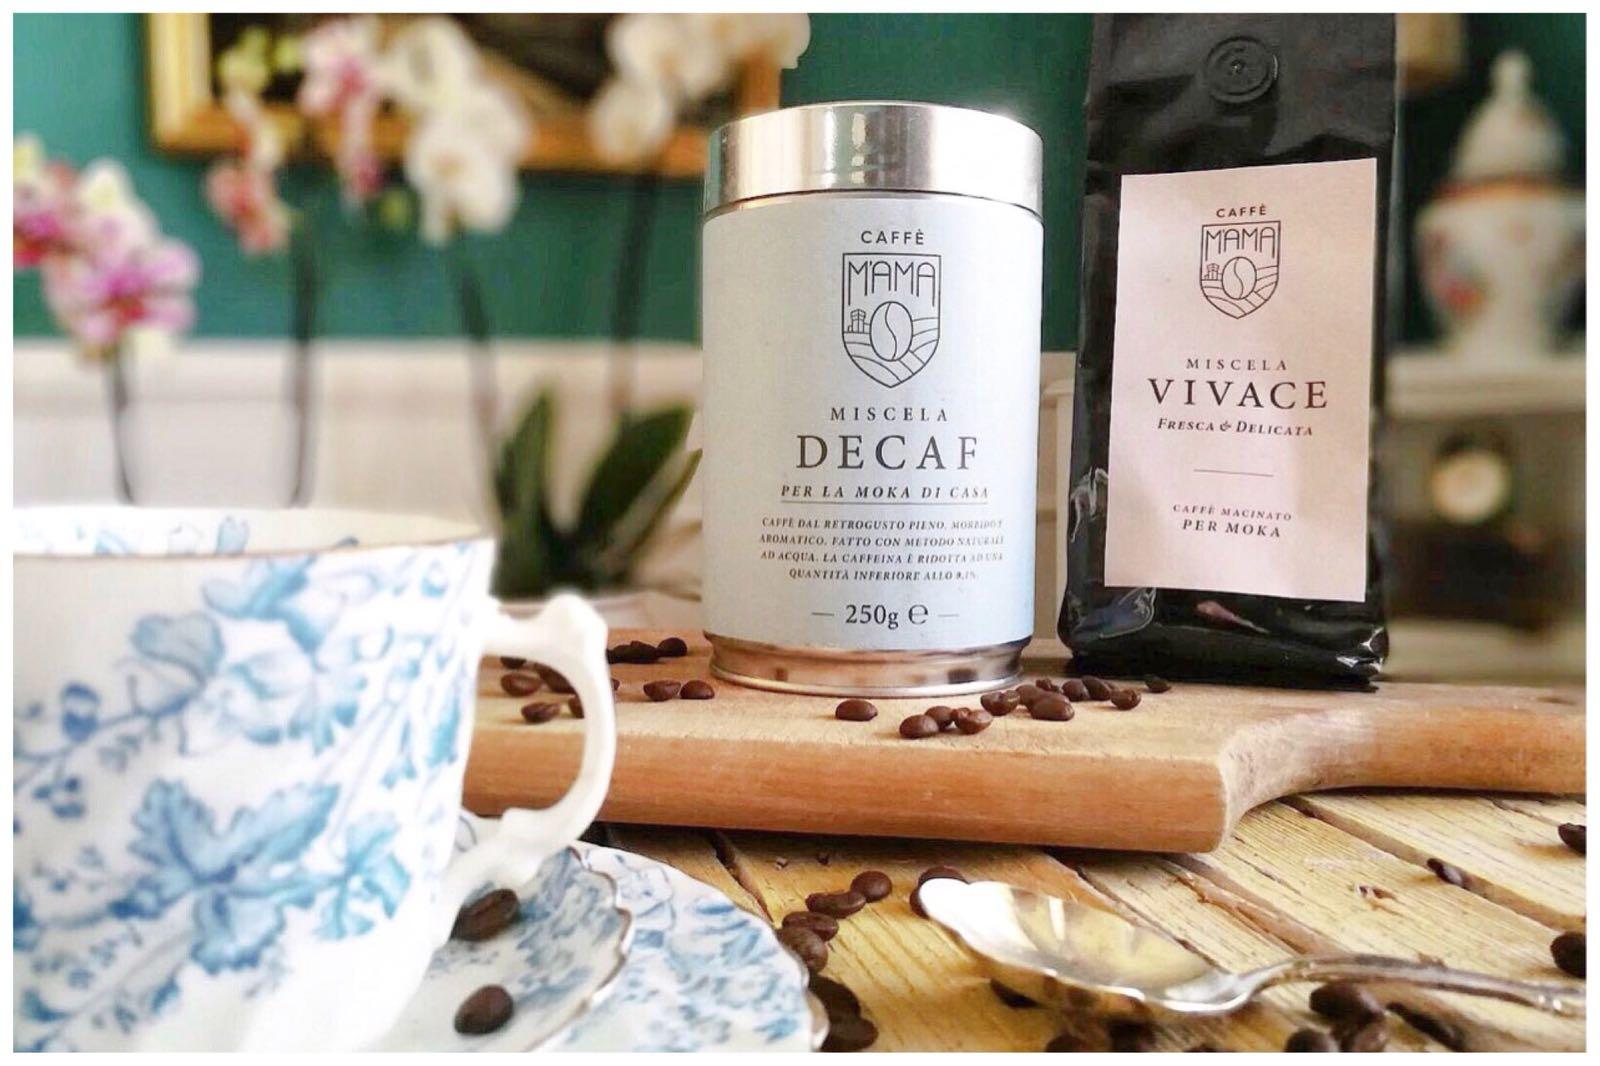 tazze vintage per caffè mama